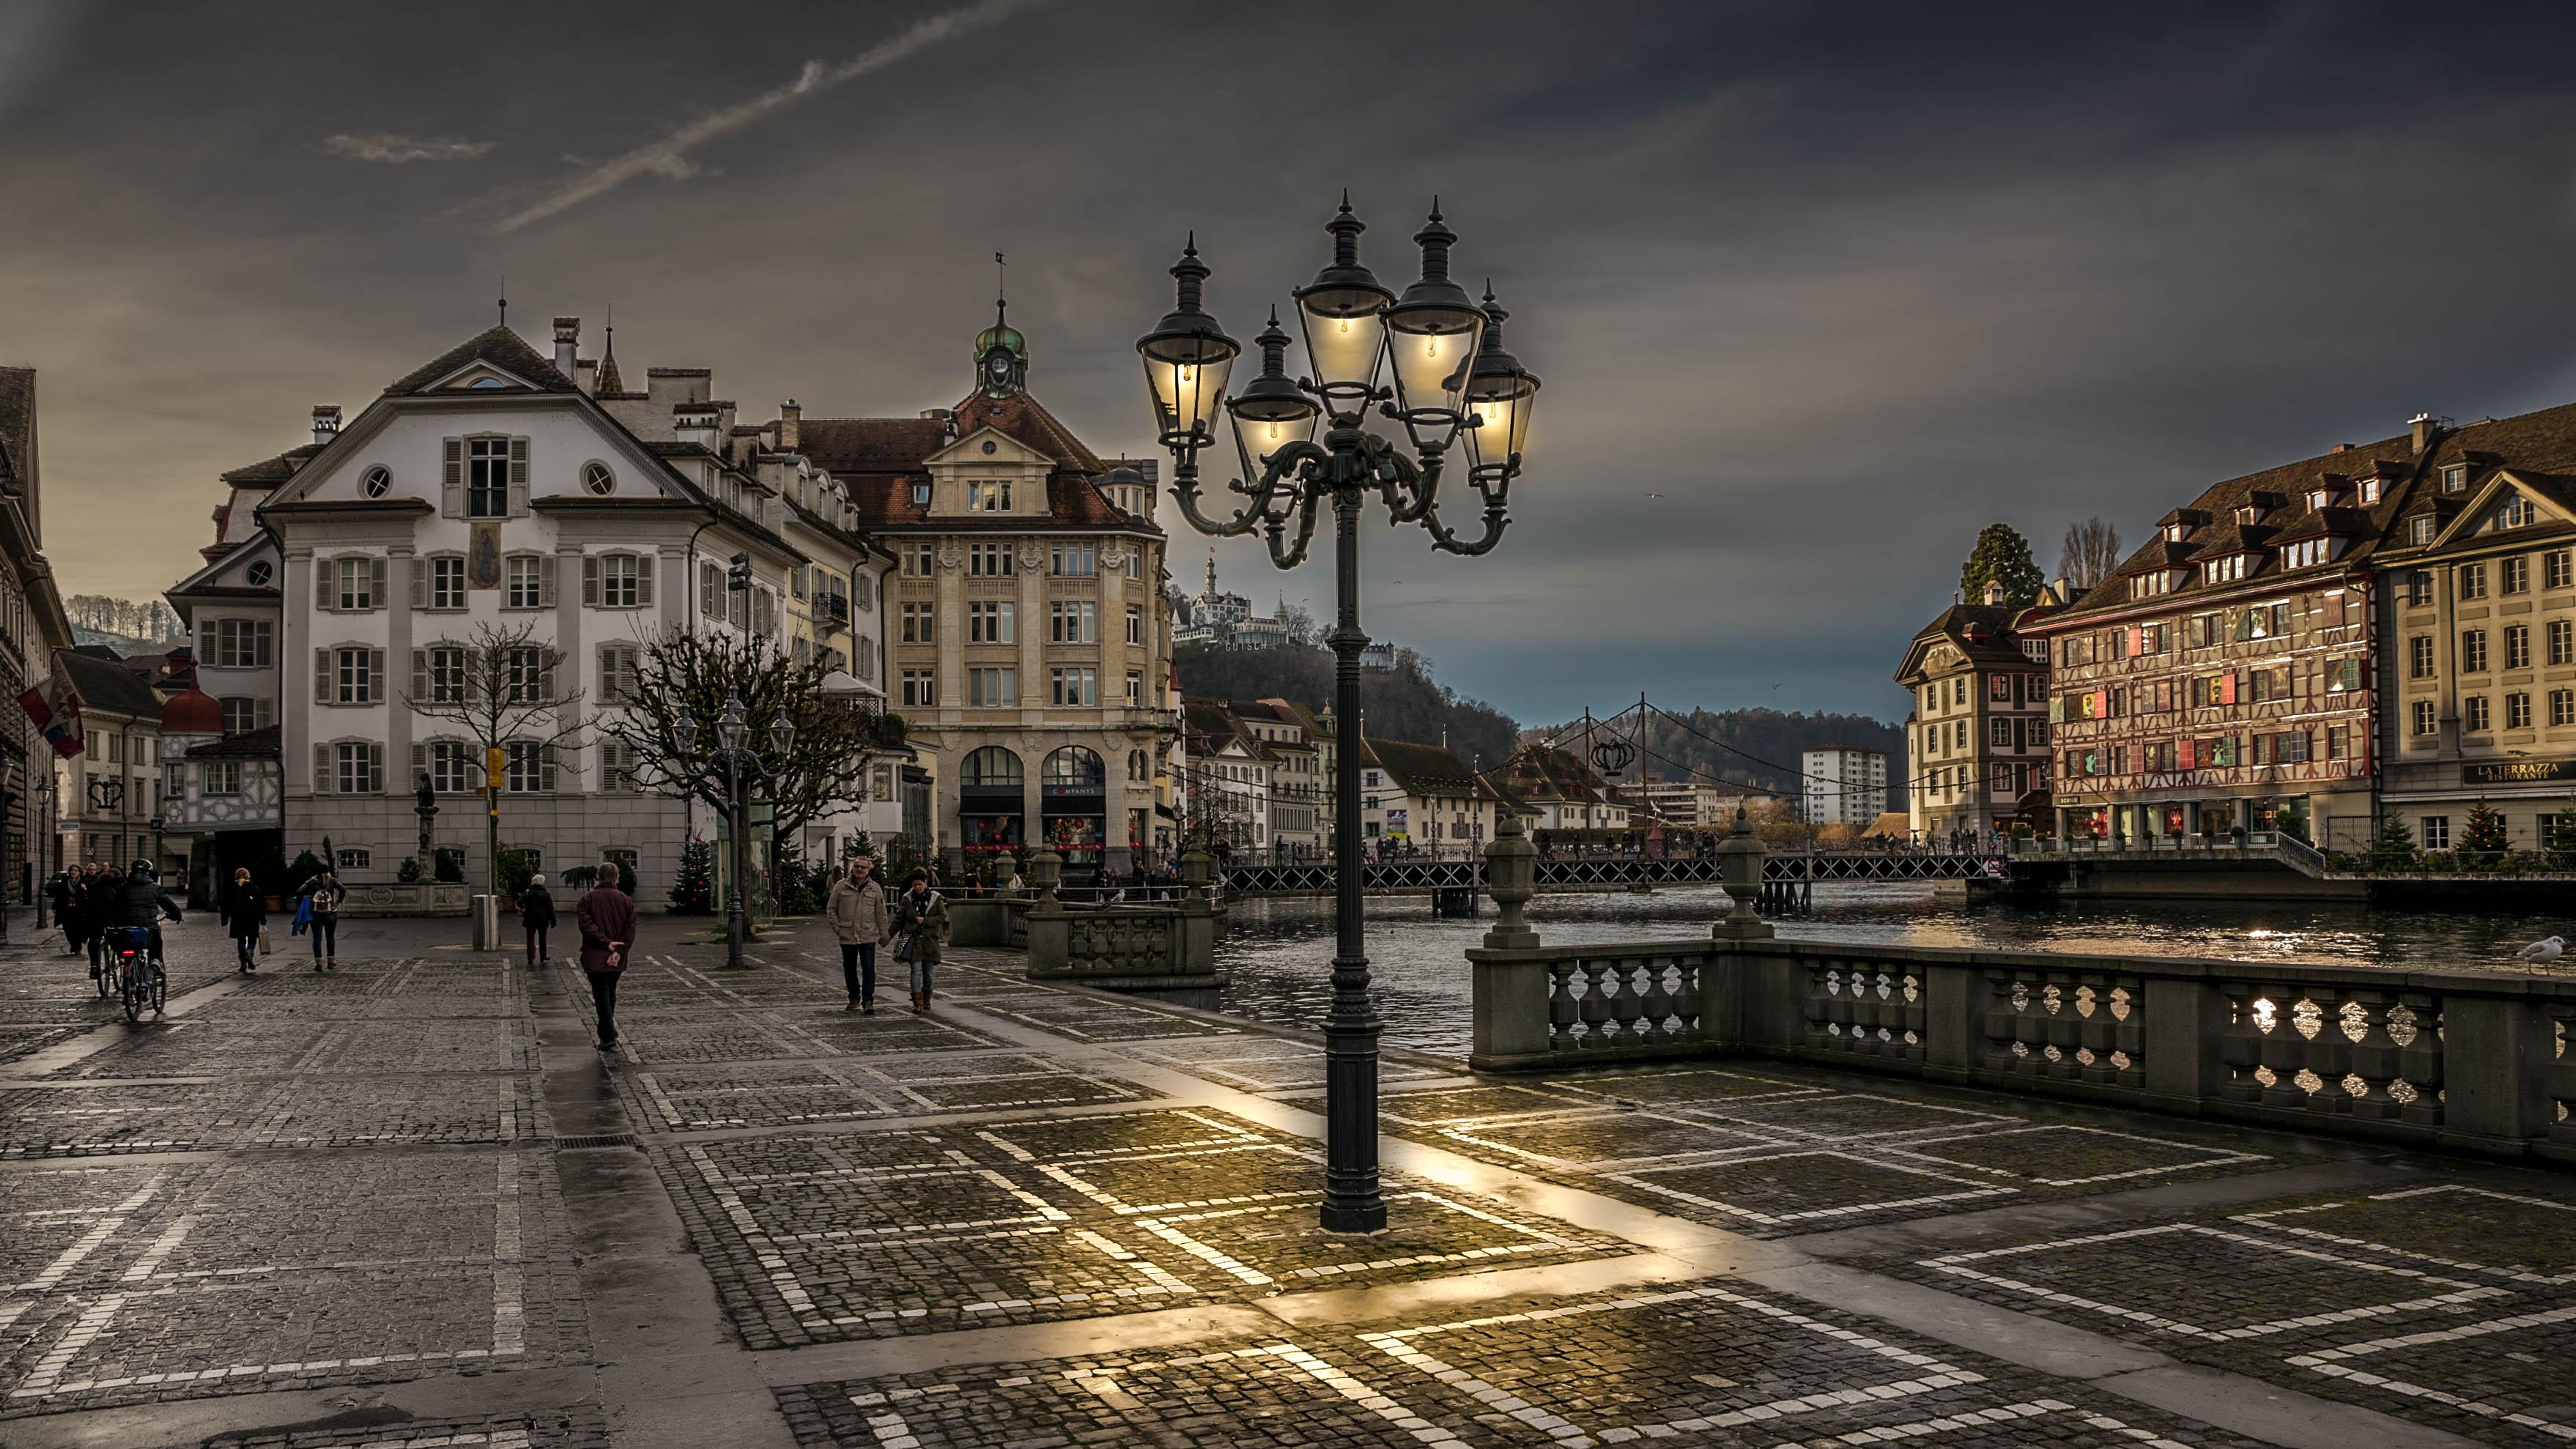 Wallpaper Photography Schweiz Switzerland Nikon